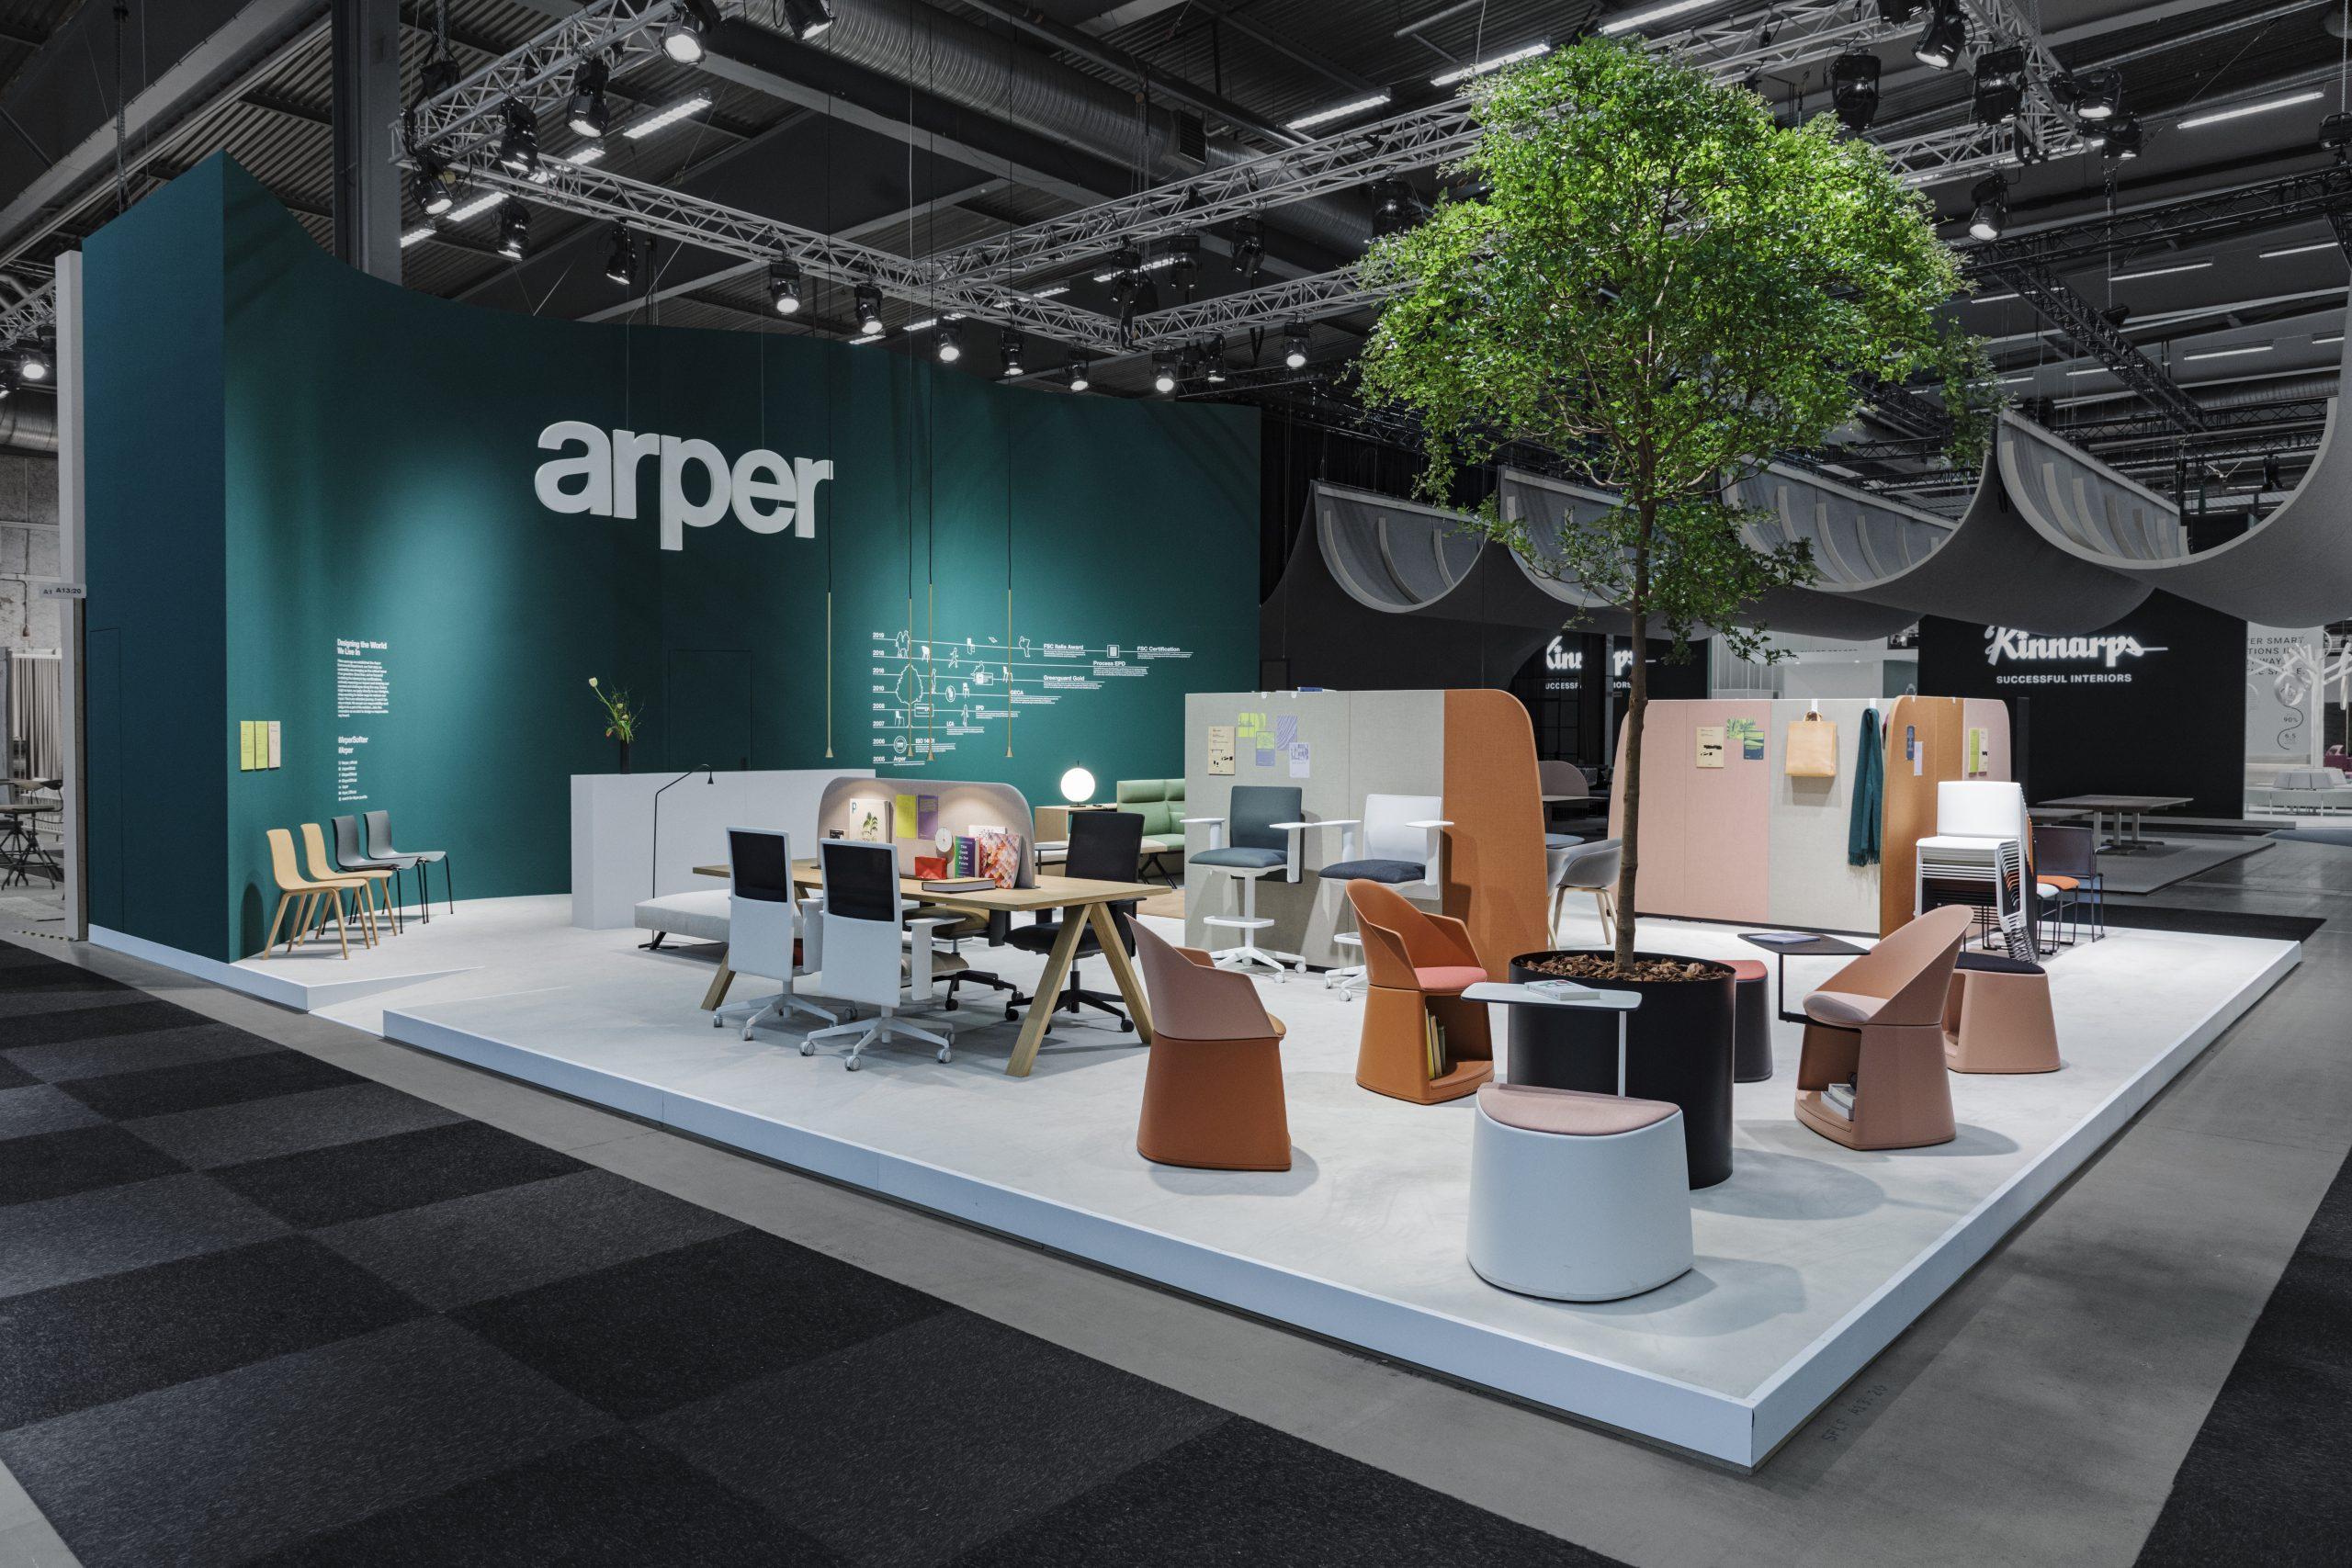 Stand Arper -Stoccolma 2020- La Bottega Group RUNE LUNDOE PHOTOGRAPHY